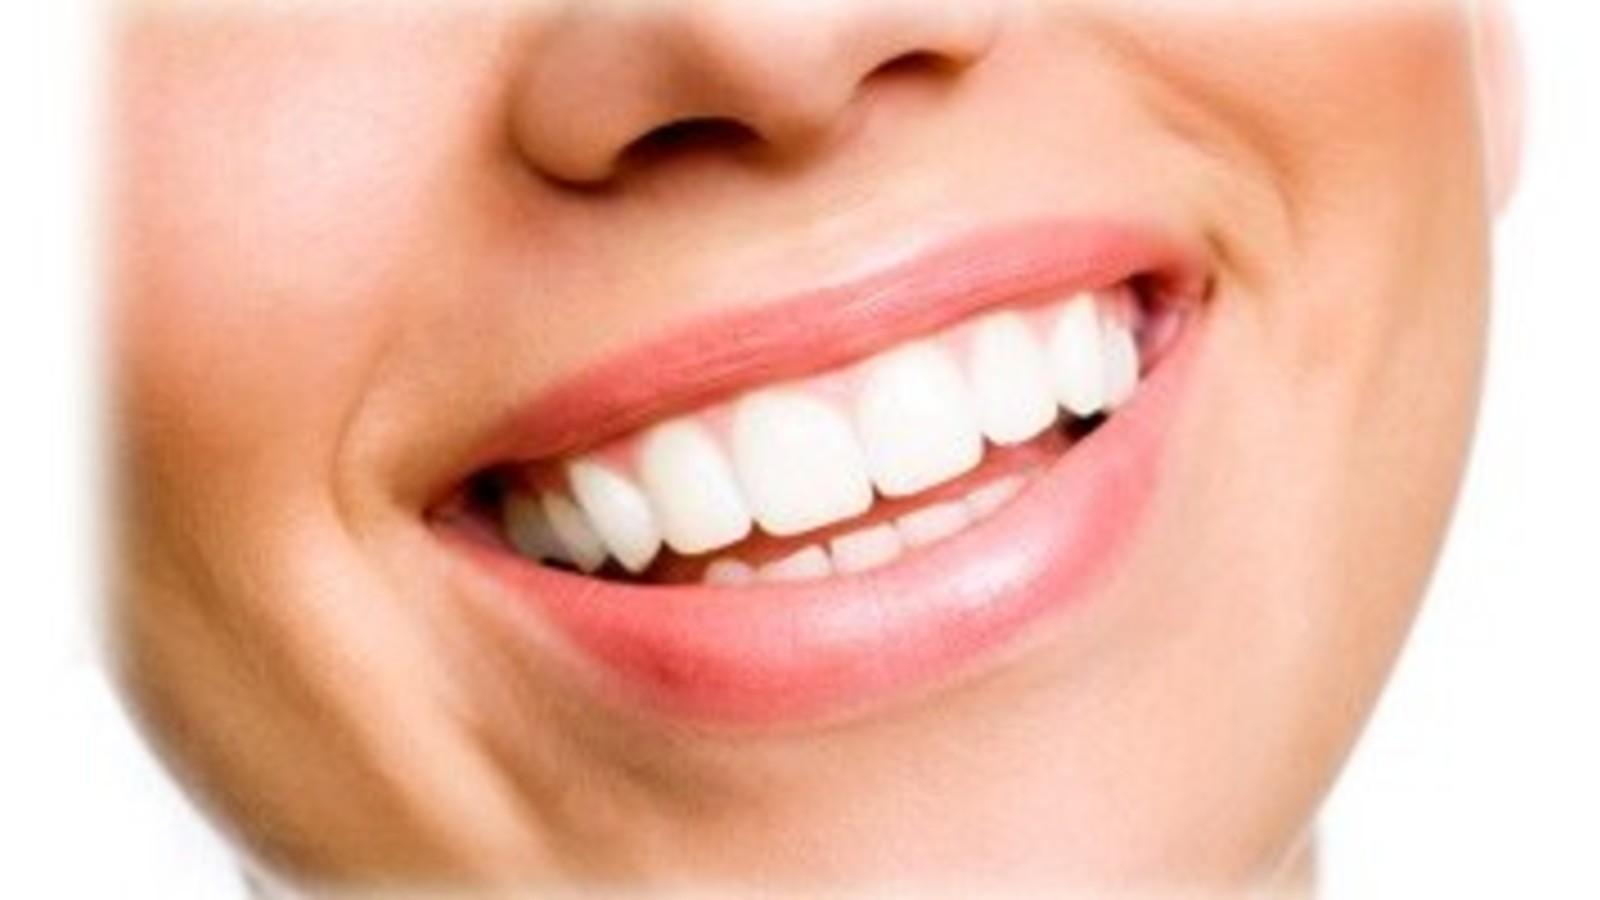 Best Teeth Whiteners For August 2020 Teeth Whitener Reviews